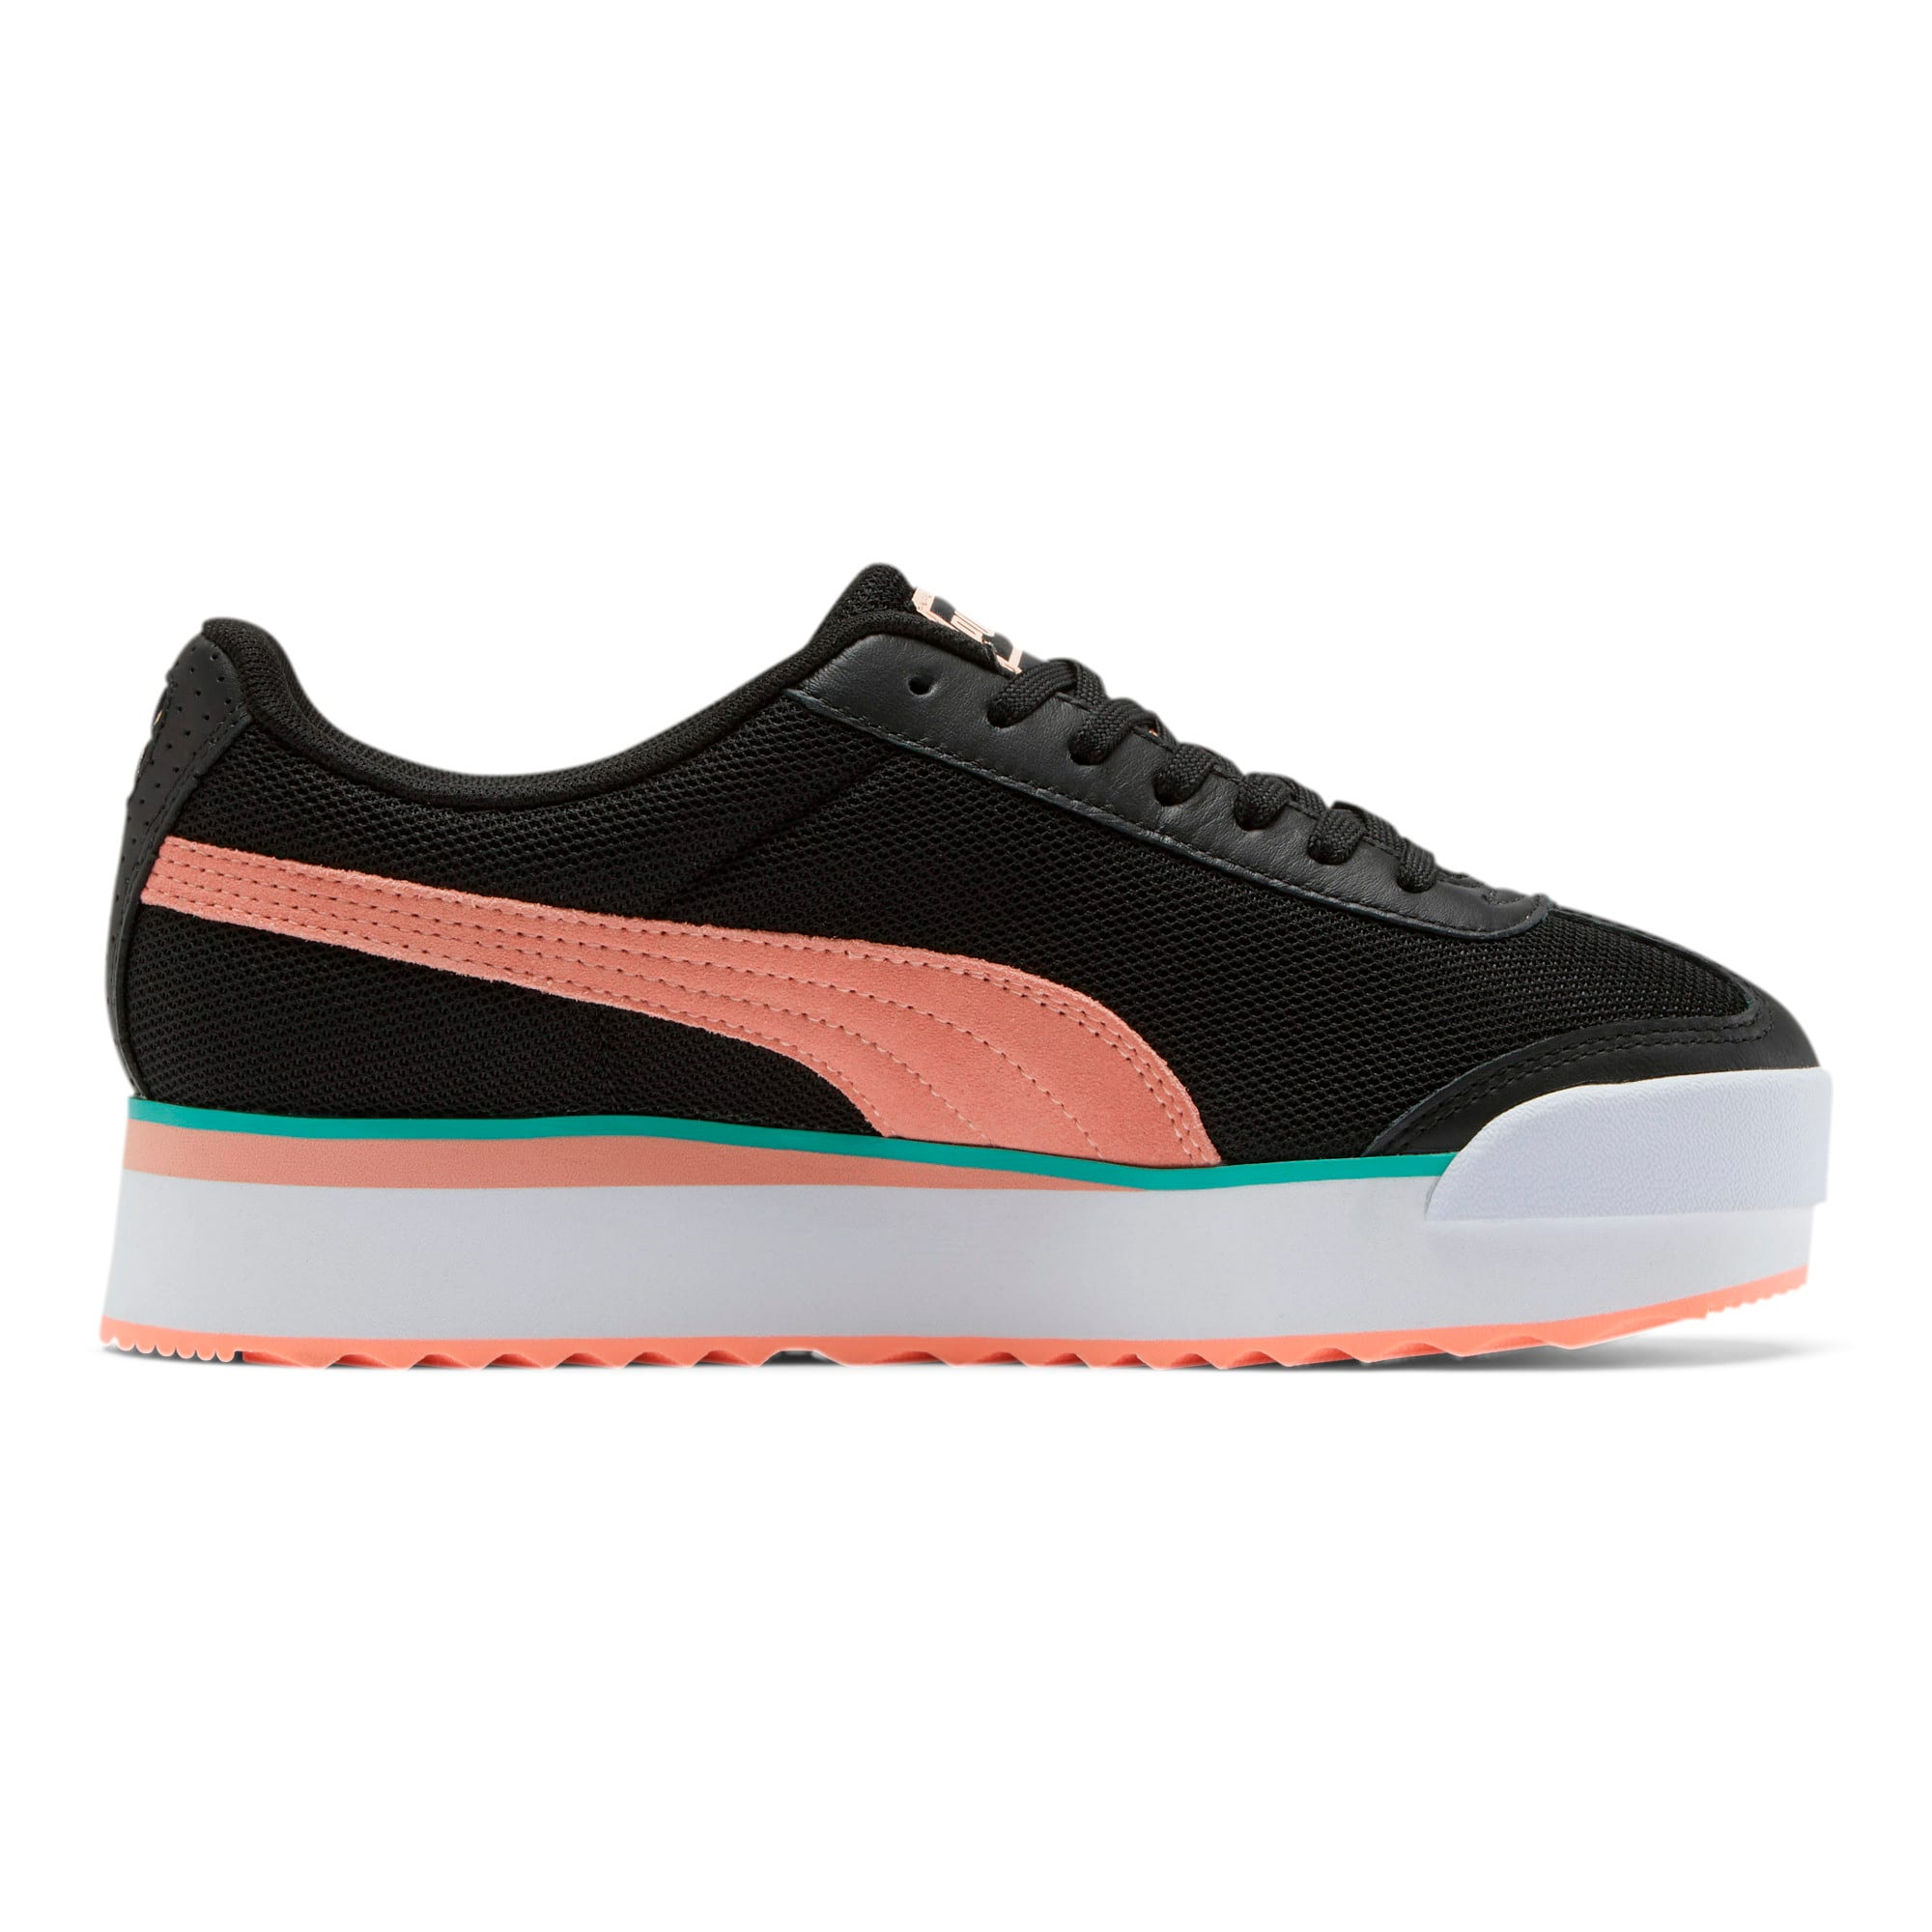 Thumbnail 5 of Roma Amor Mesh Mix Women's Sneakers, Black-Br Peach-Ble Turquoise, medium